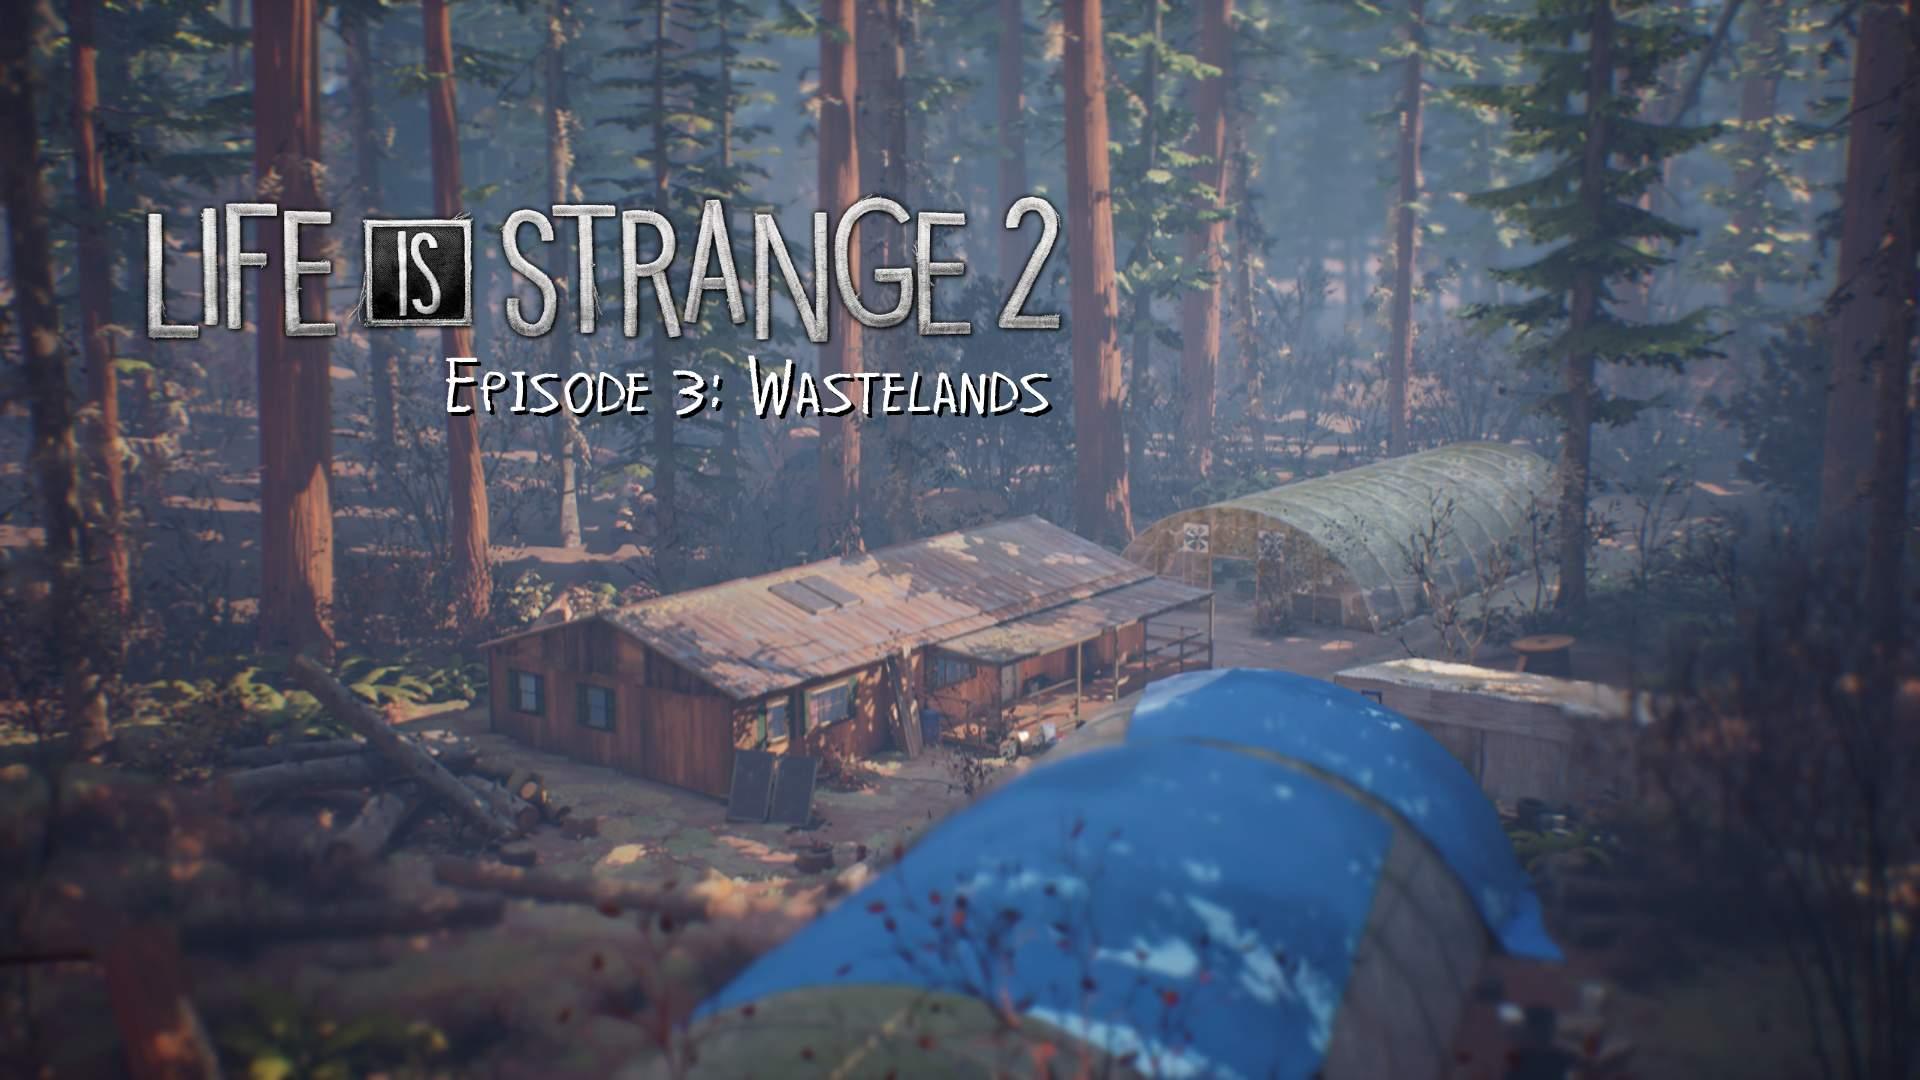 Life is Strange 2 Episode 3 Title Screen